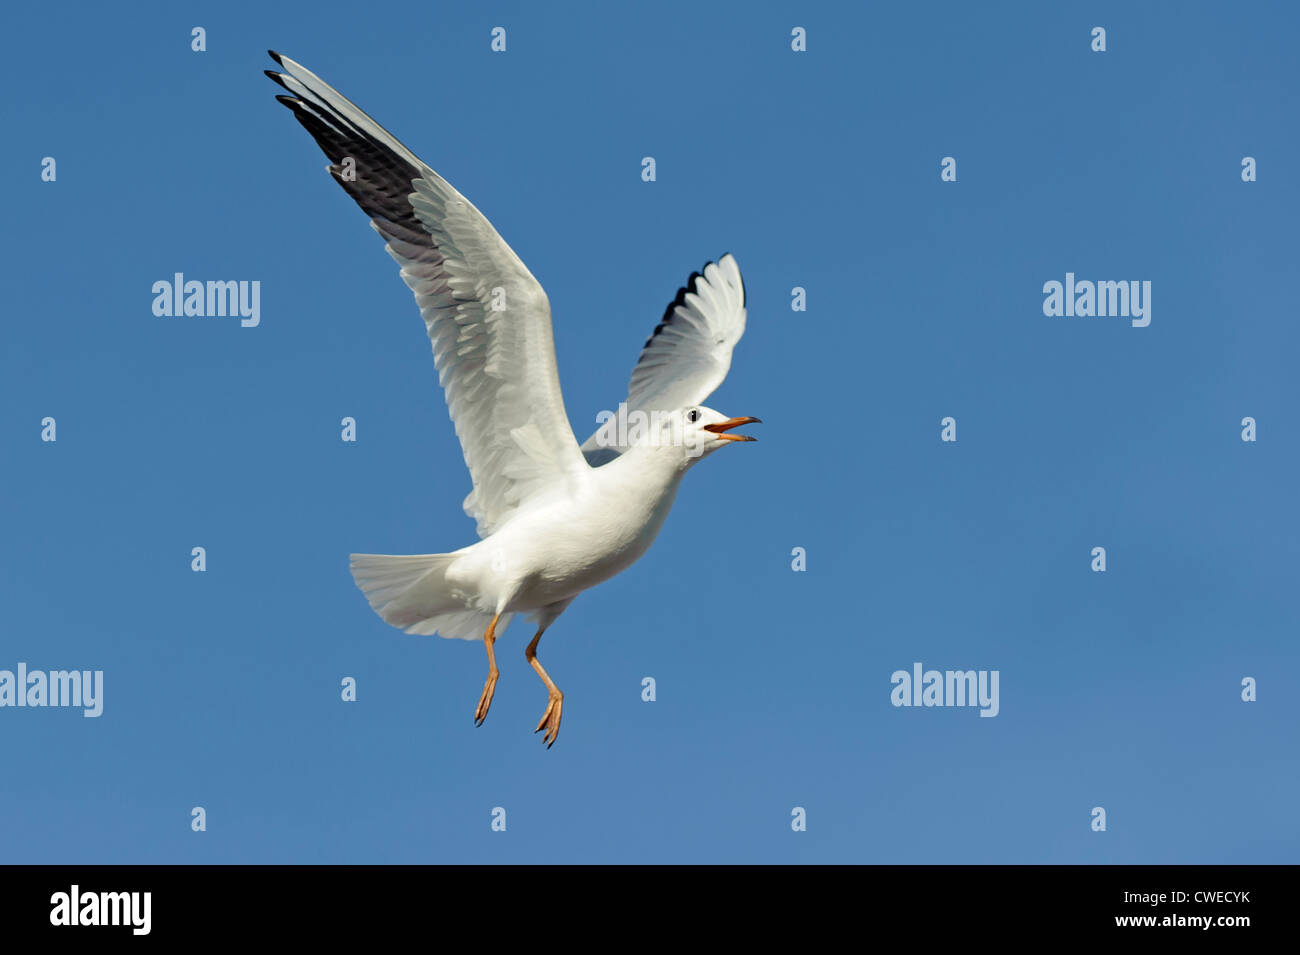 Black-headed gull (Larus ridibundus) winter plumage adult in flight. Norfolk. November. - Stock Image